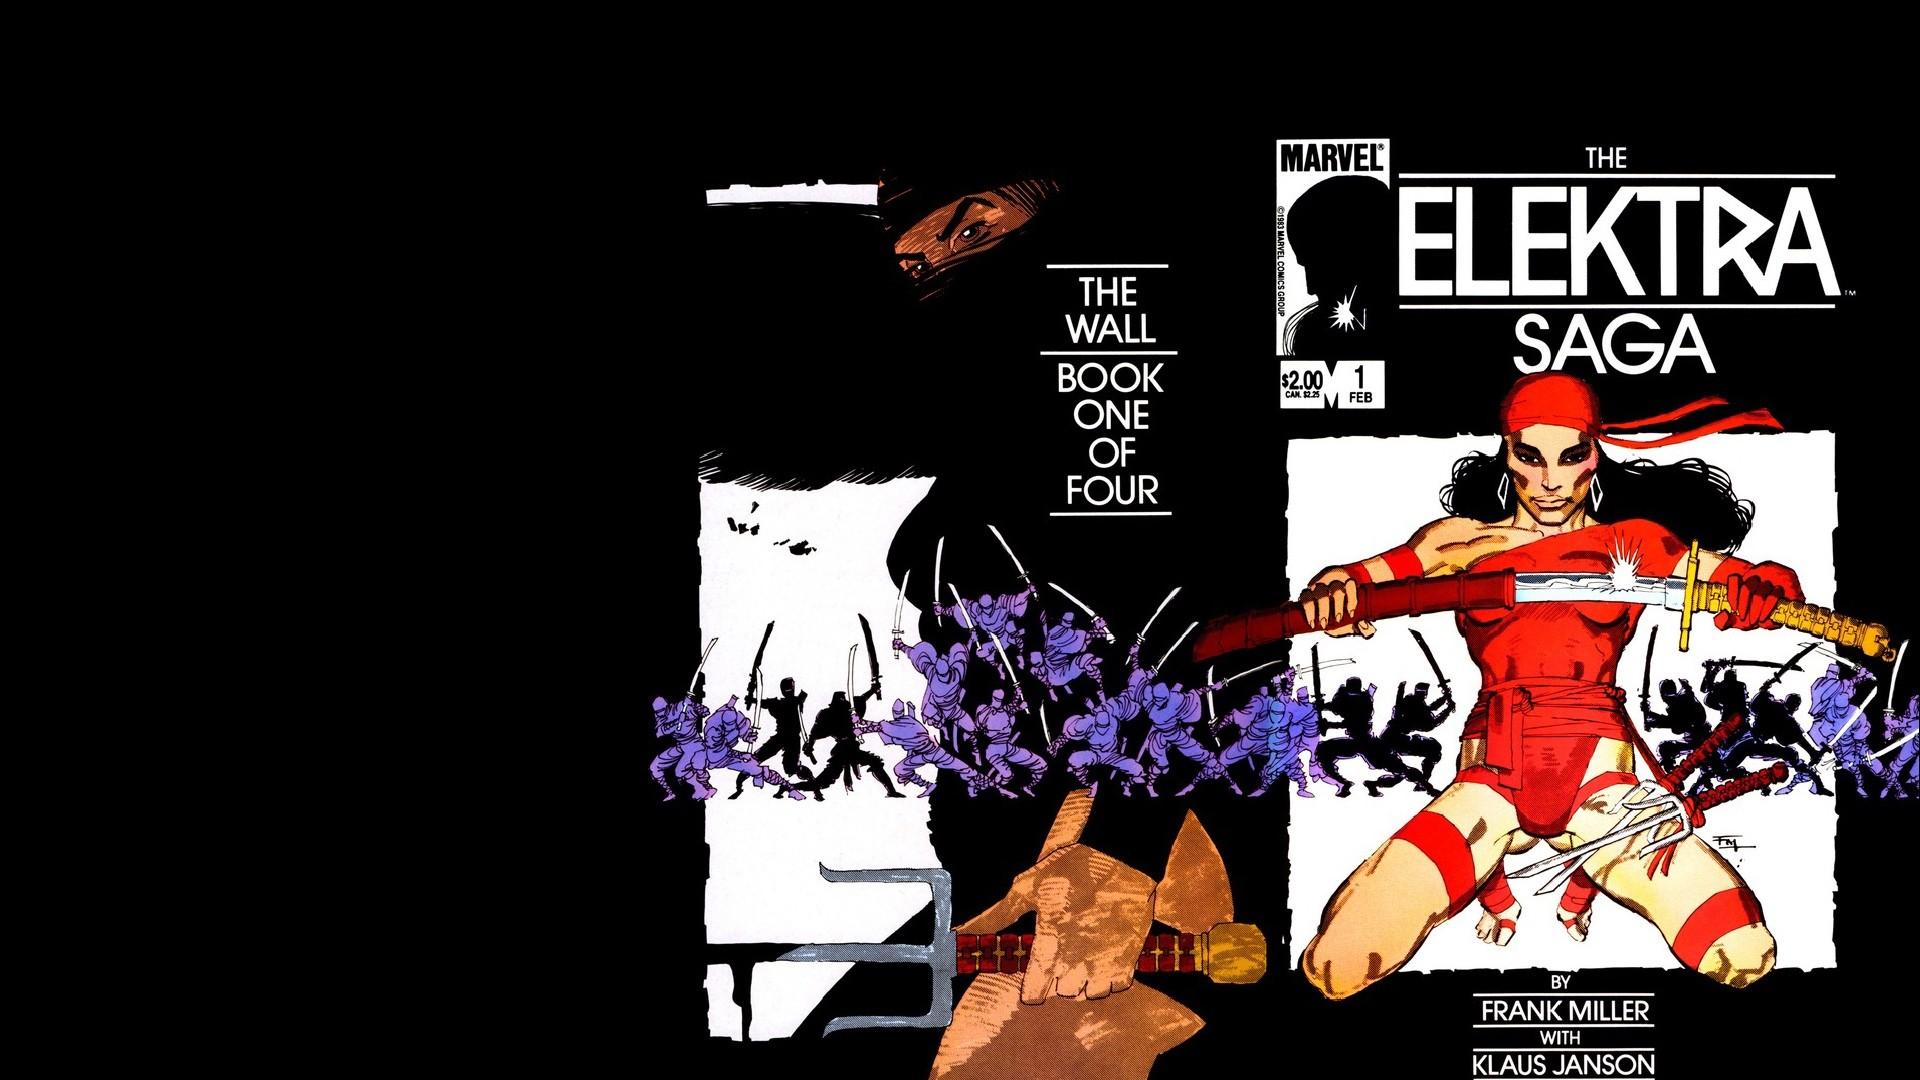 Filename: The-Elektra-Saga-Comic-Wallpapers.jpg